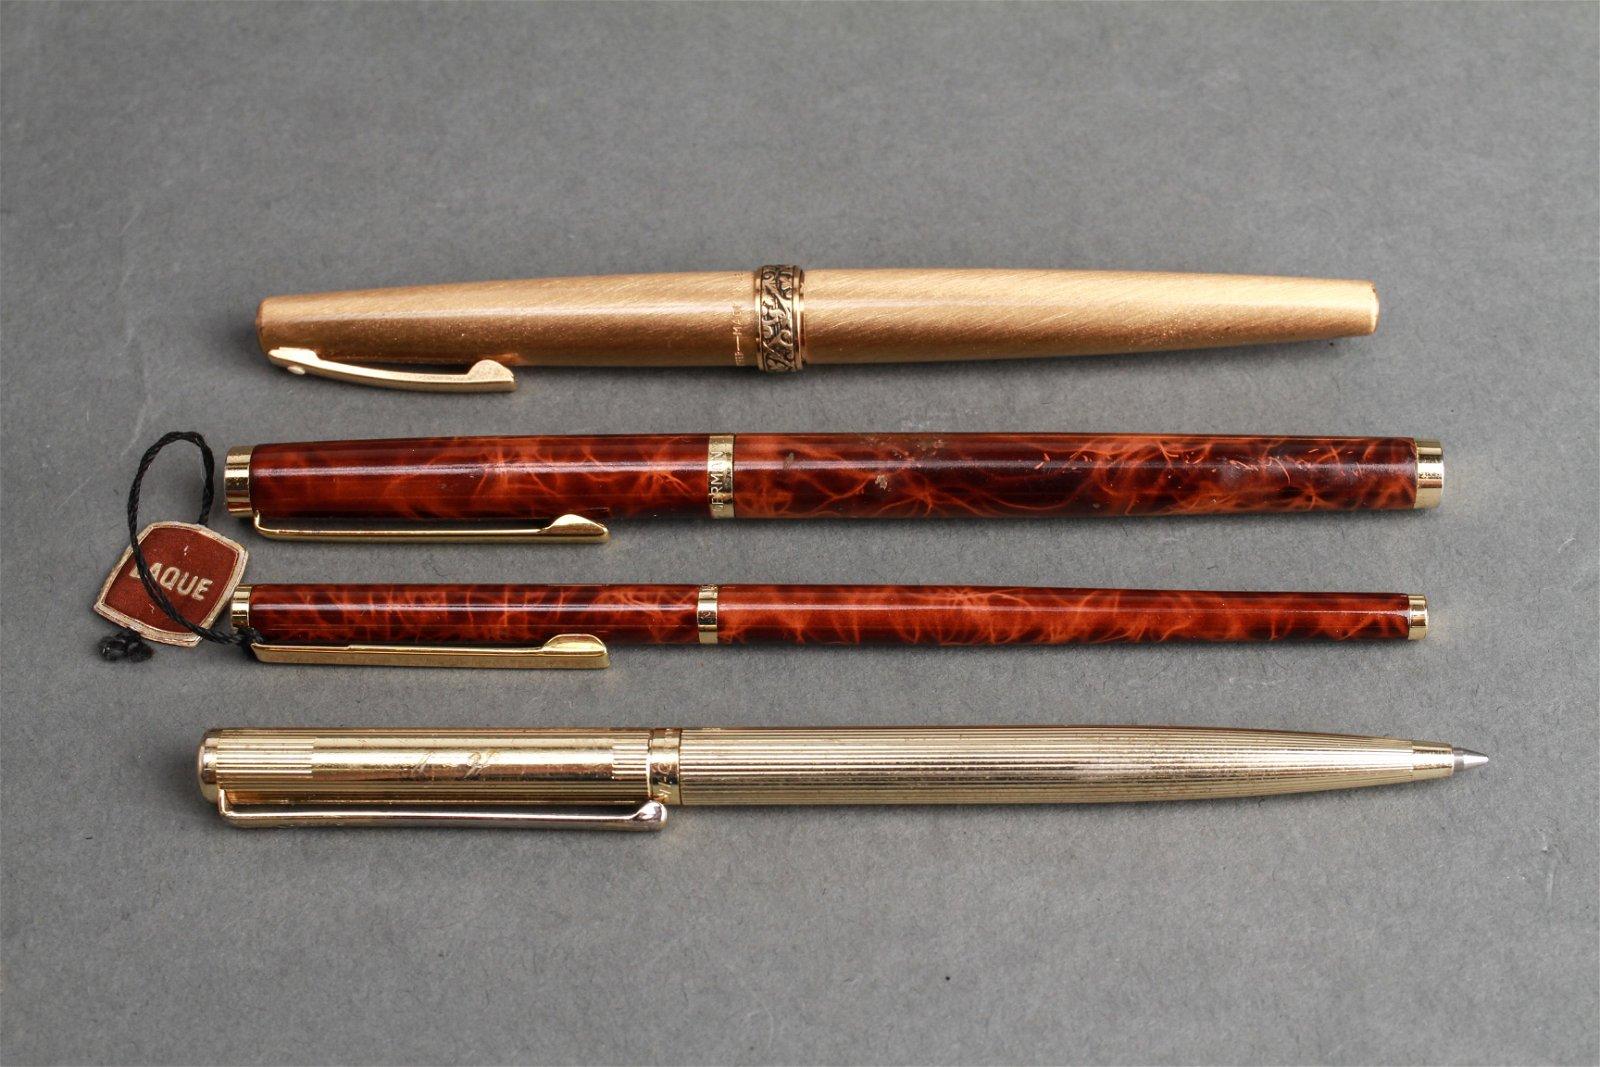 Fountain Pens & Ballpoint Pens Group of 4